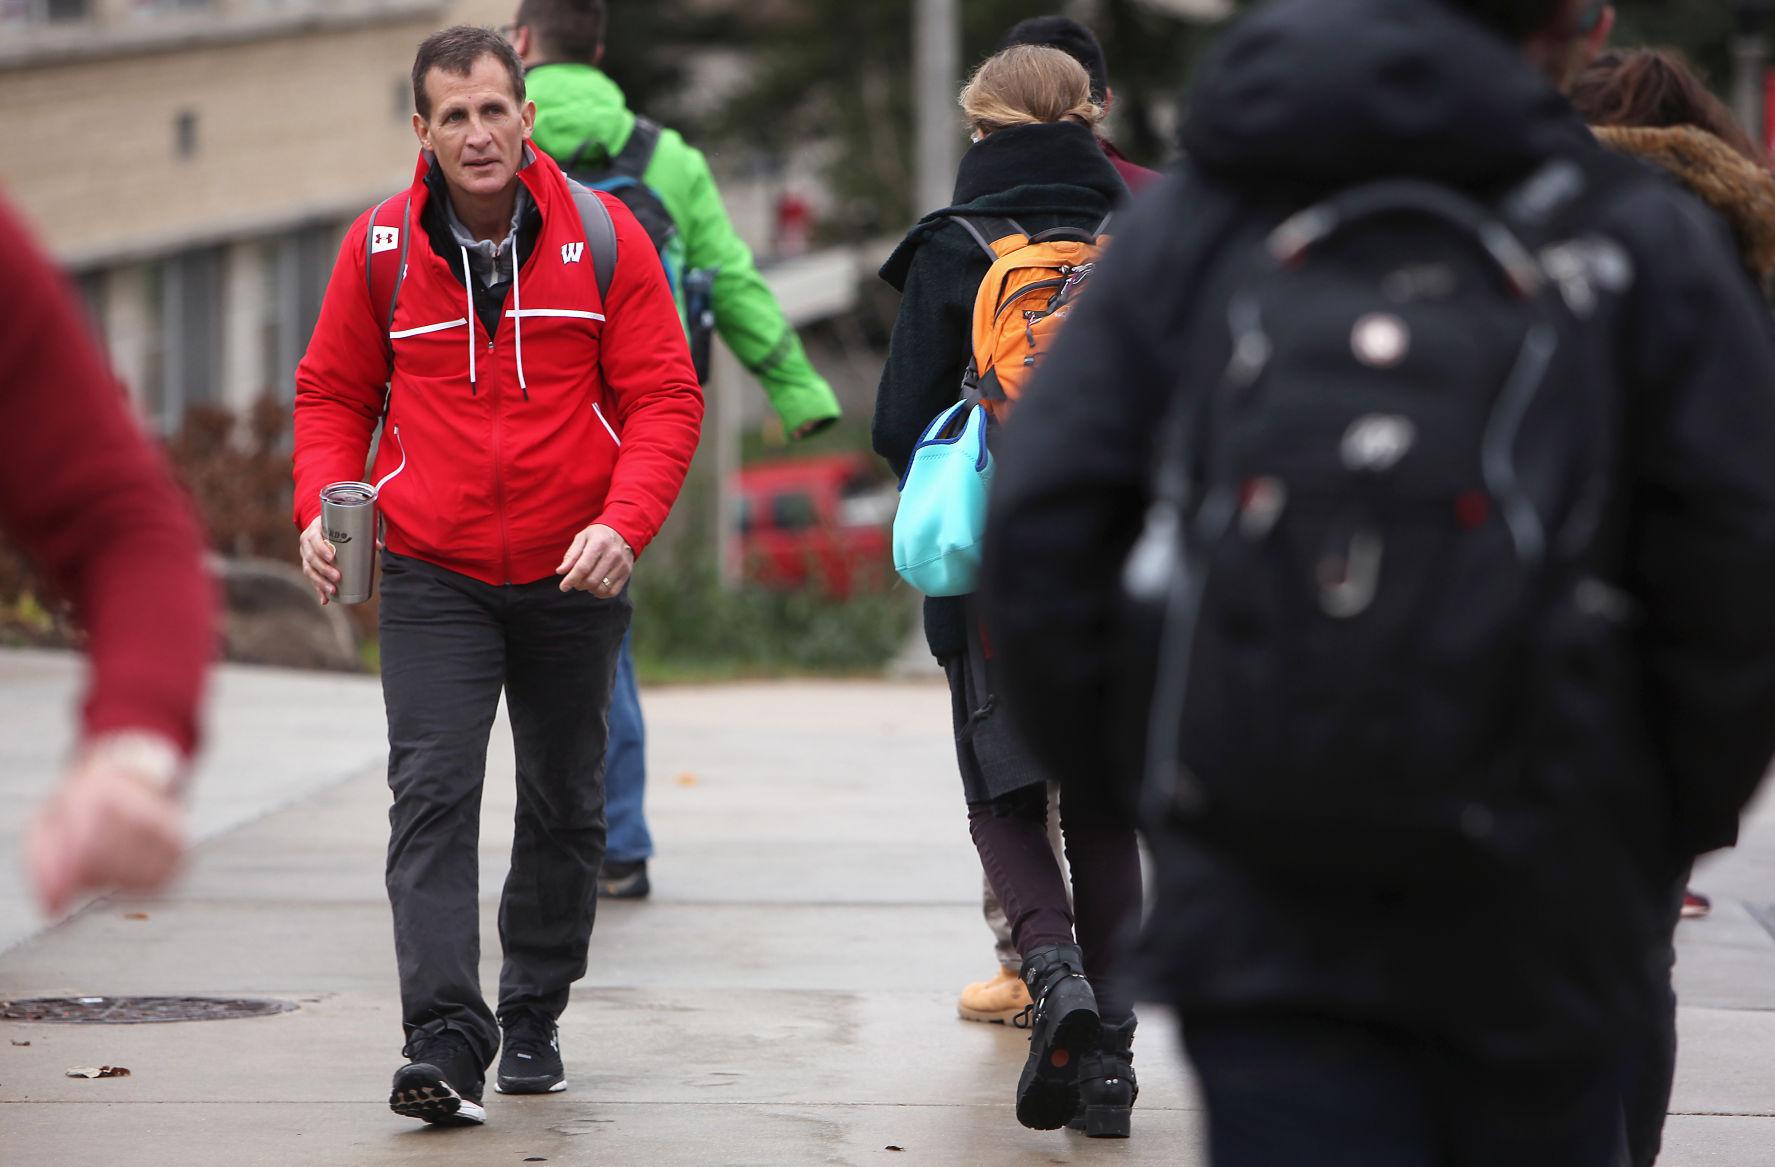 BIG10: Badgers - Graduation Completes A 'long Journey' For Wisconsin Coach Tony Granato